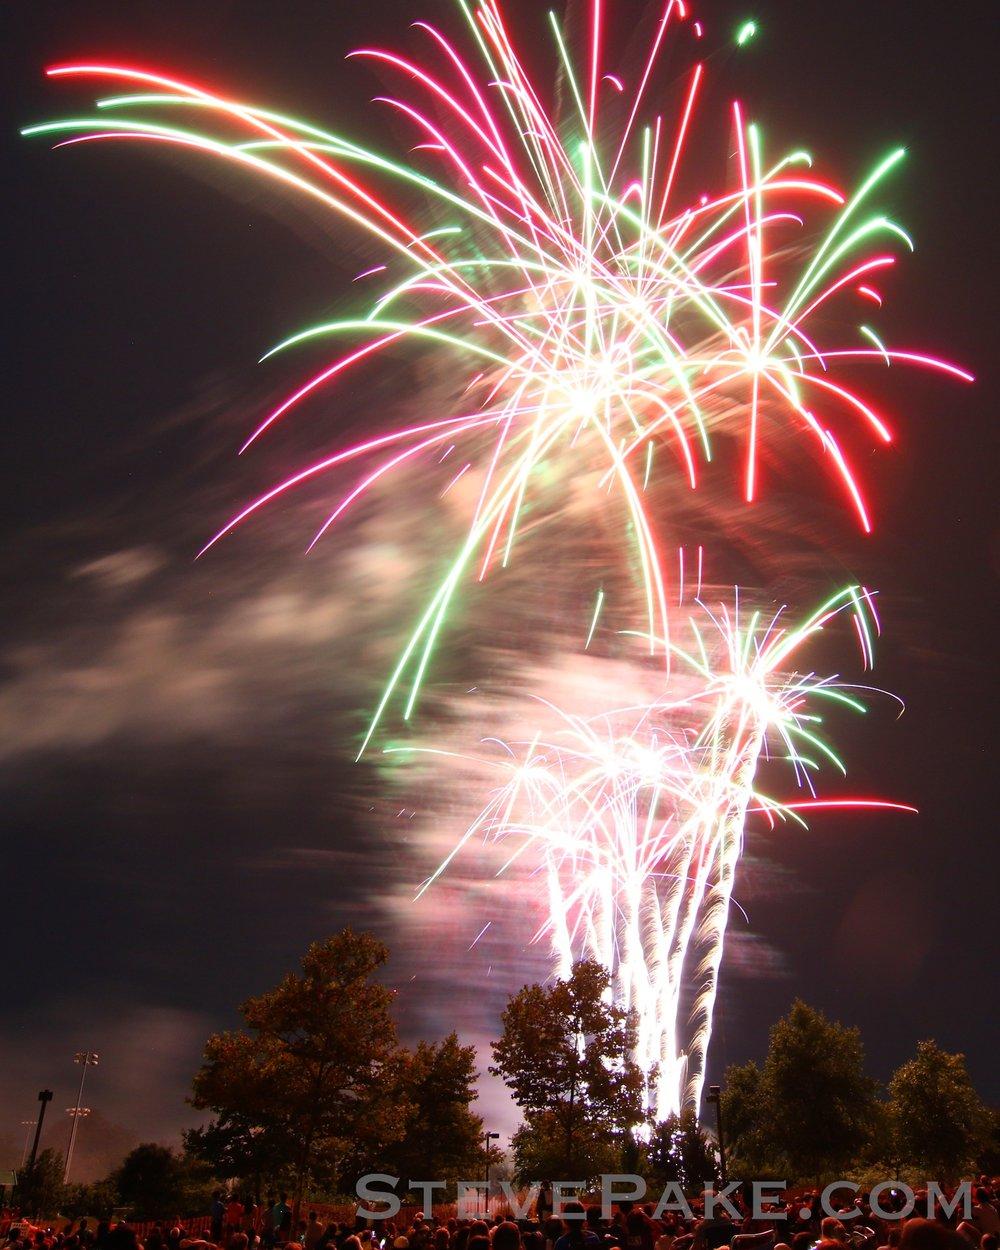 Fireworks2018_59_GE3A8610vap-HD-WM.jpg